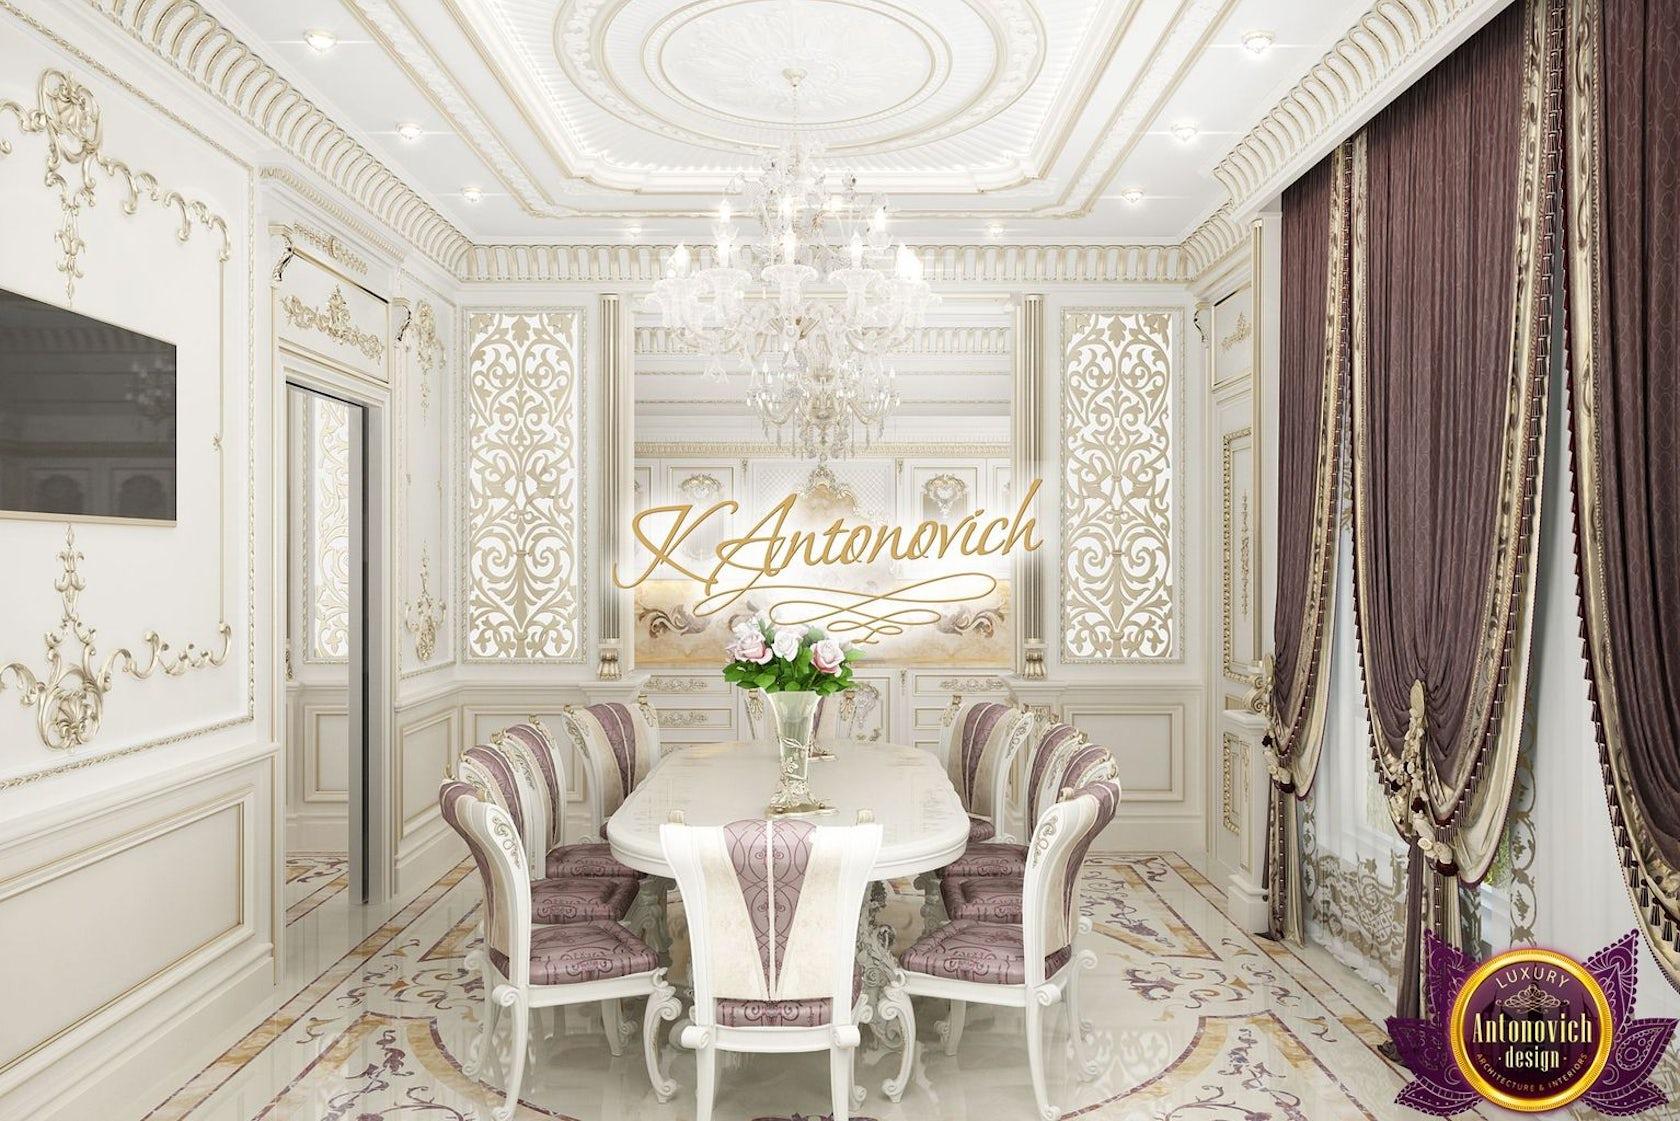 Kitchen Design Usa By Katrina Antonovich: Luxurious Kitchen Design From Katrina Antonovich